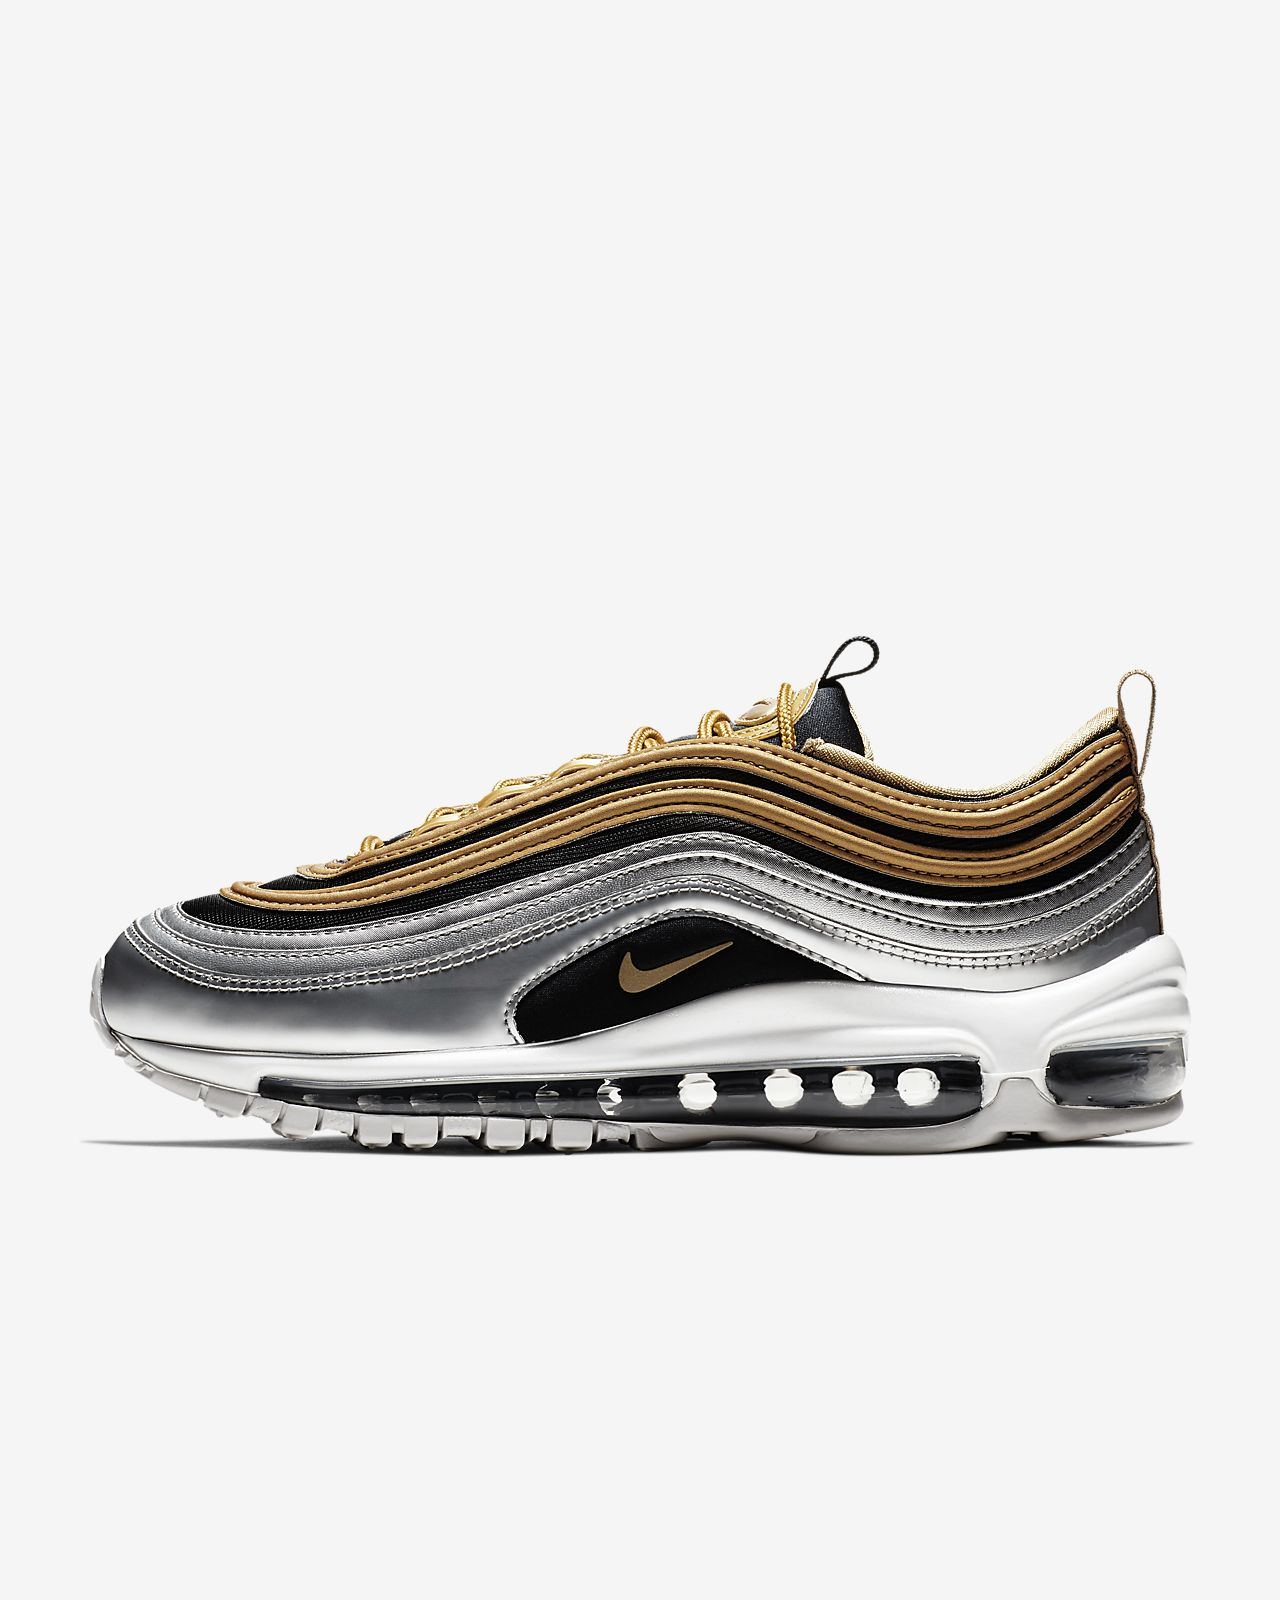 Buty damskie Nike Air Max 97 SE Metallic